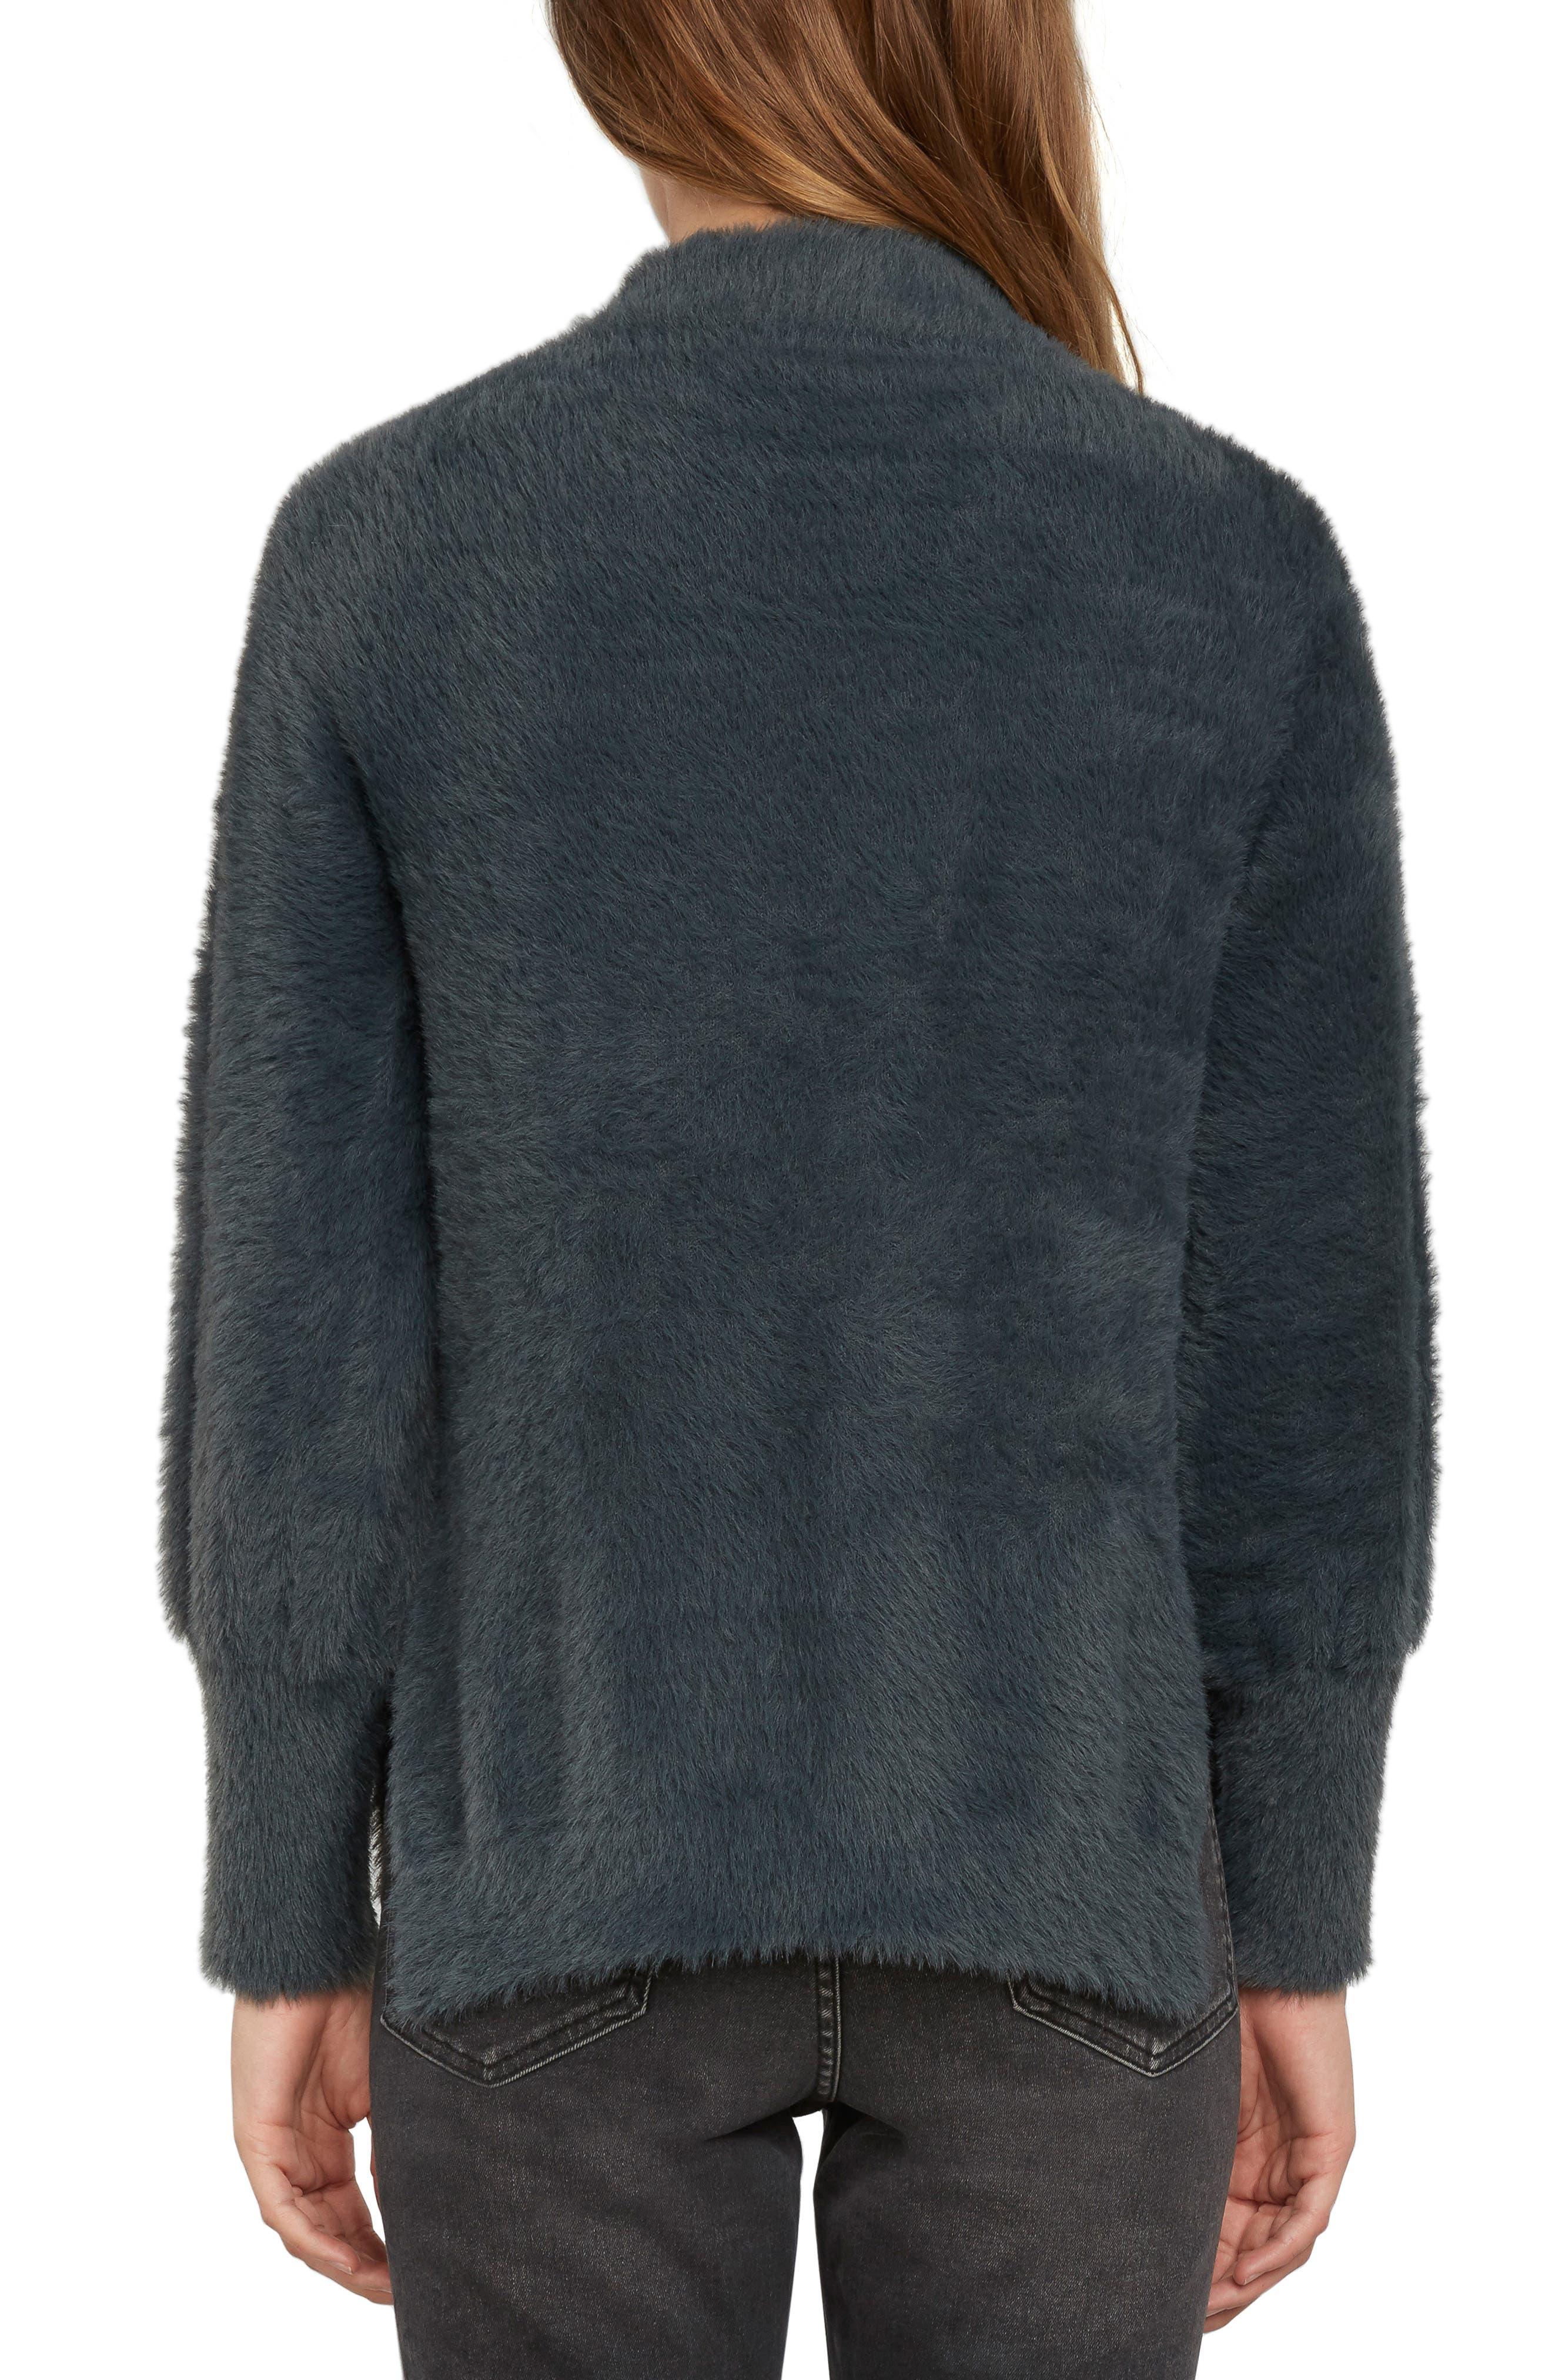 Fuzzy Mock Neck Sweater,                             Alternate thumbnail 2, color,                             Slate